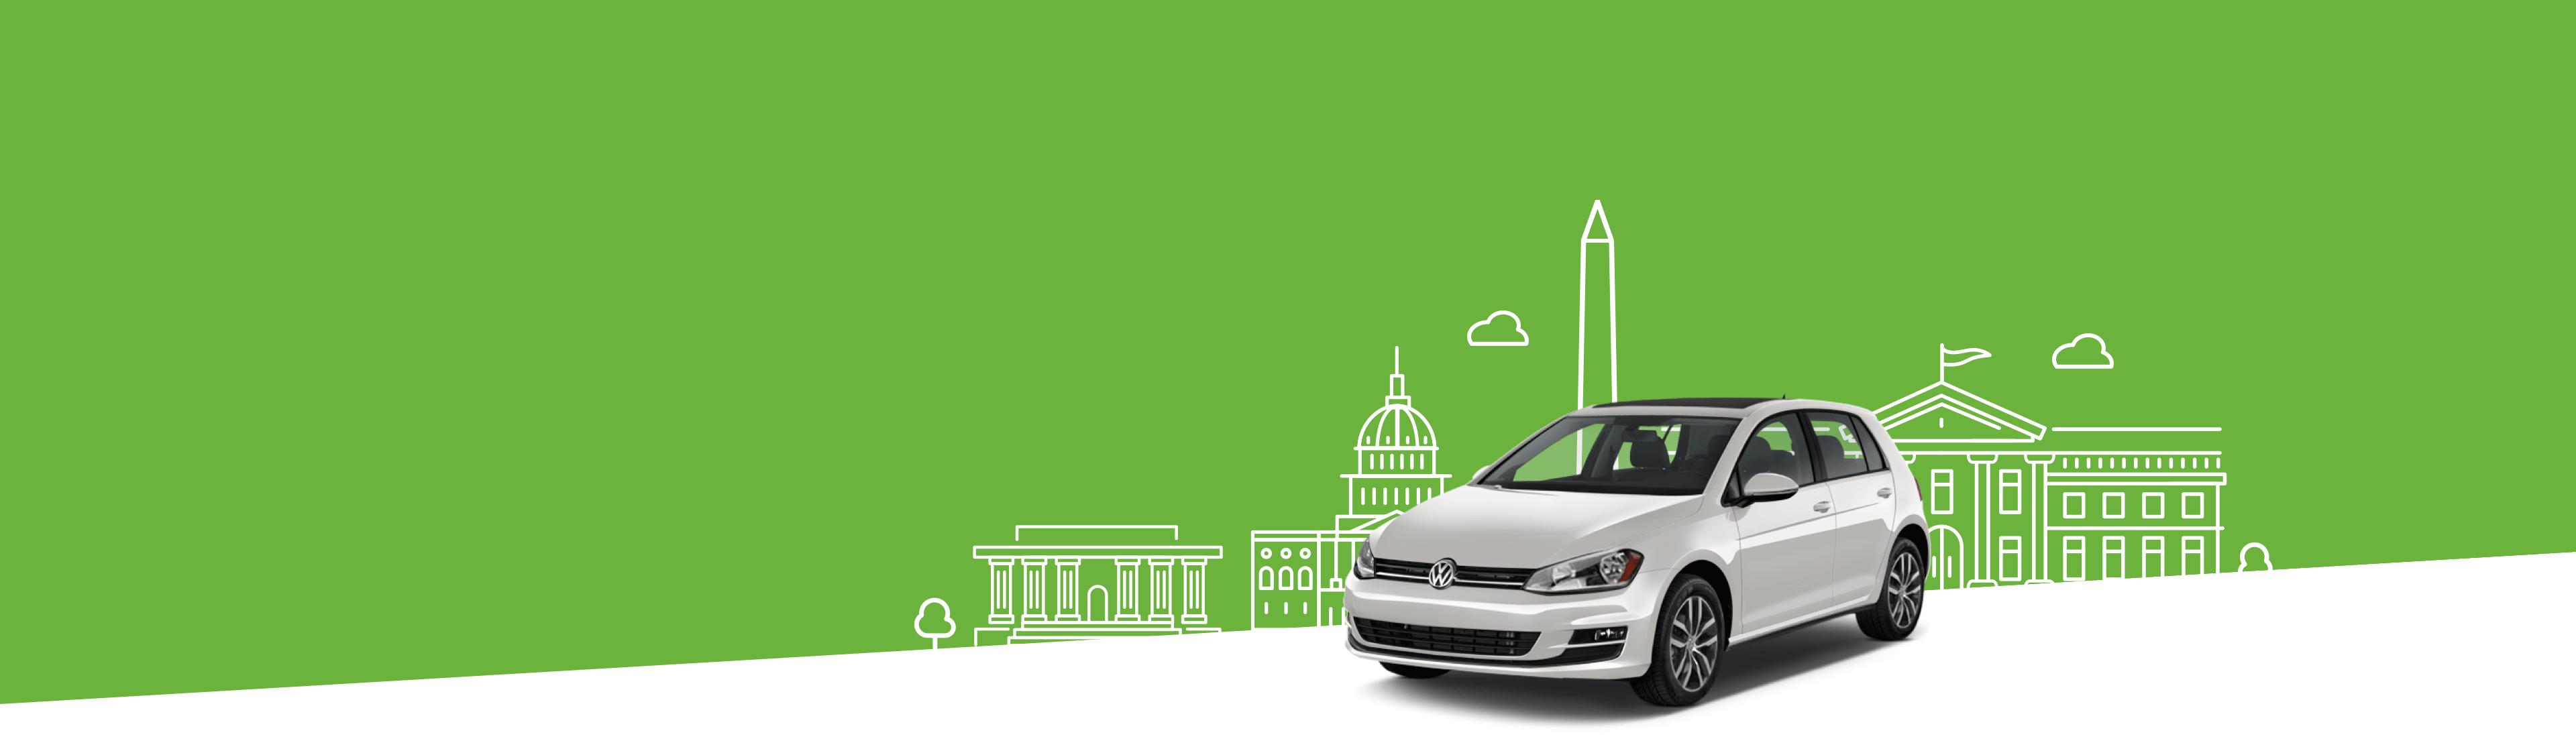 Car Sharing Amp Hourly Car Rental In Washington D C Zipcar